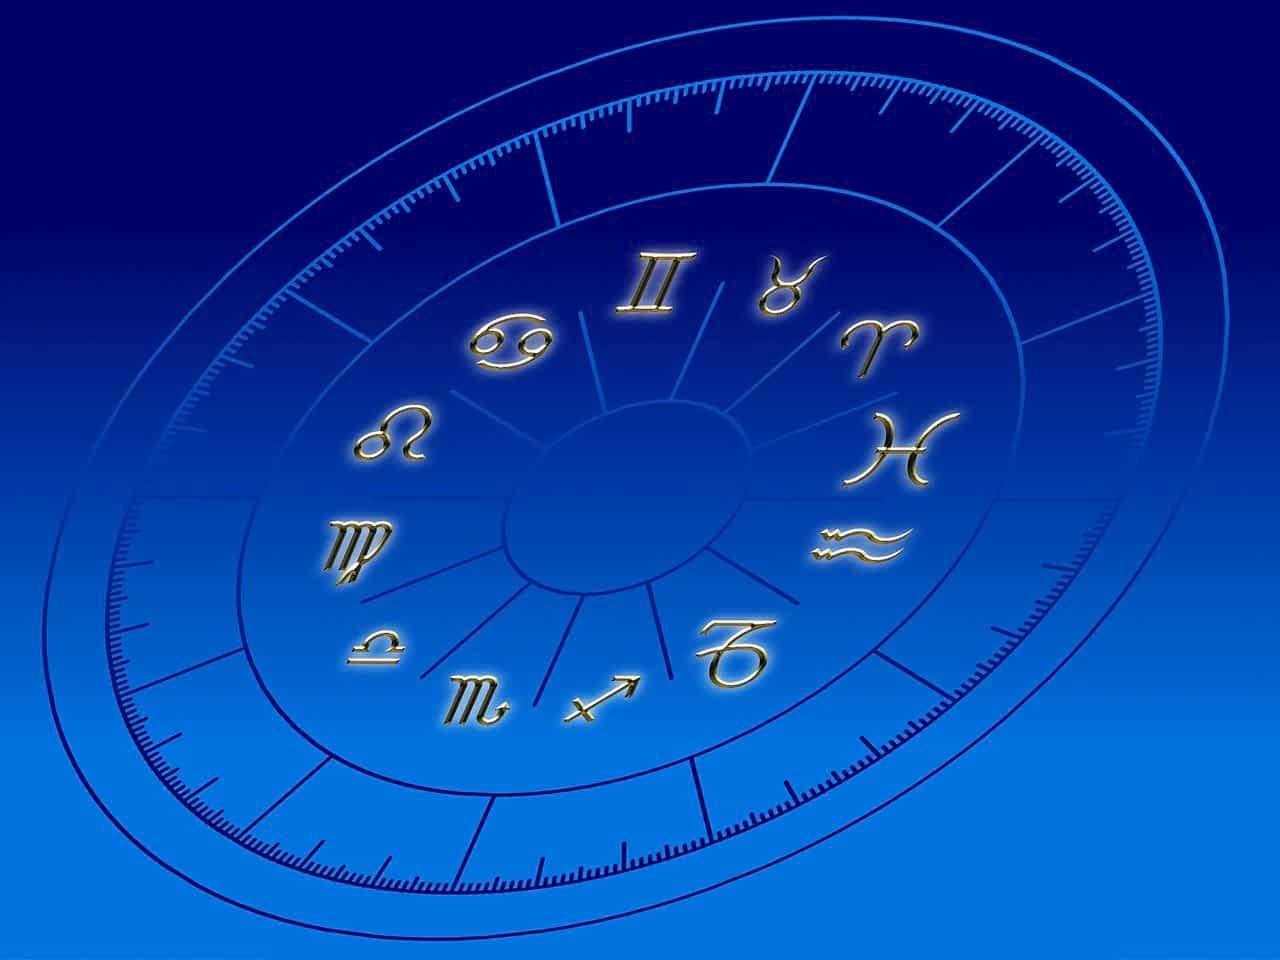 астрология знаки зодиака фото